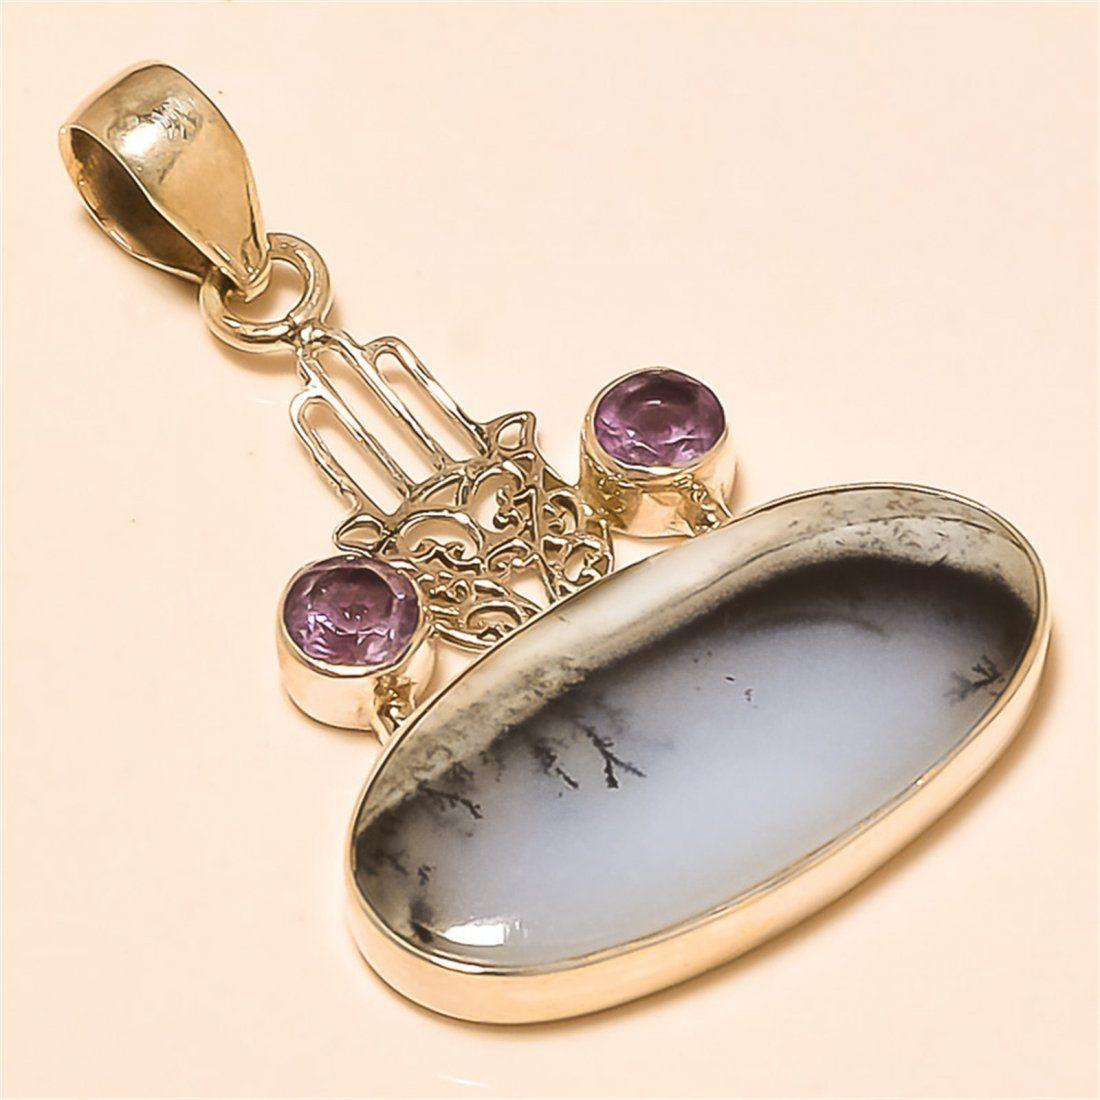 Dendrite Opal/amethyst Pendant Solid Sterling Silver